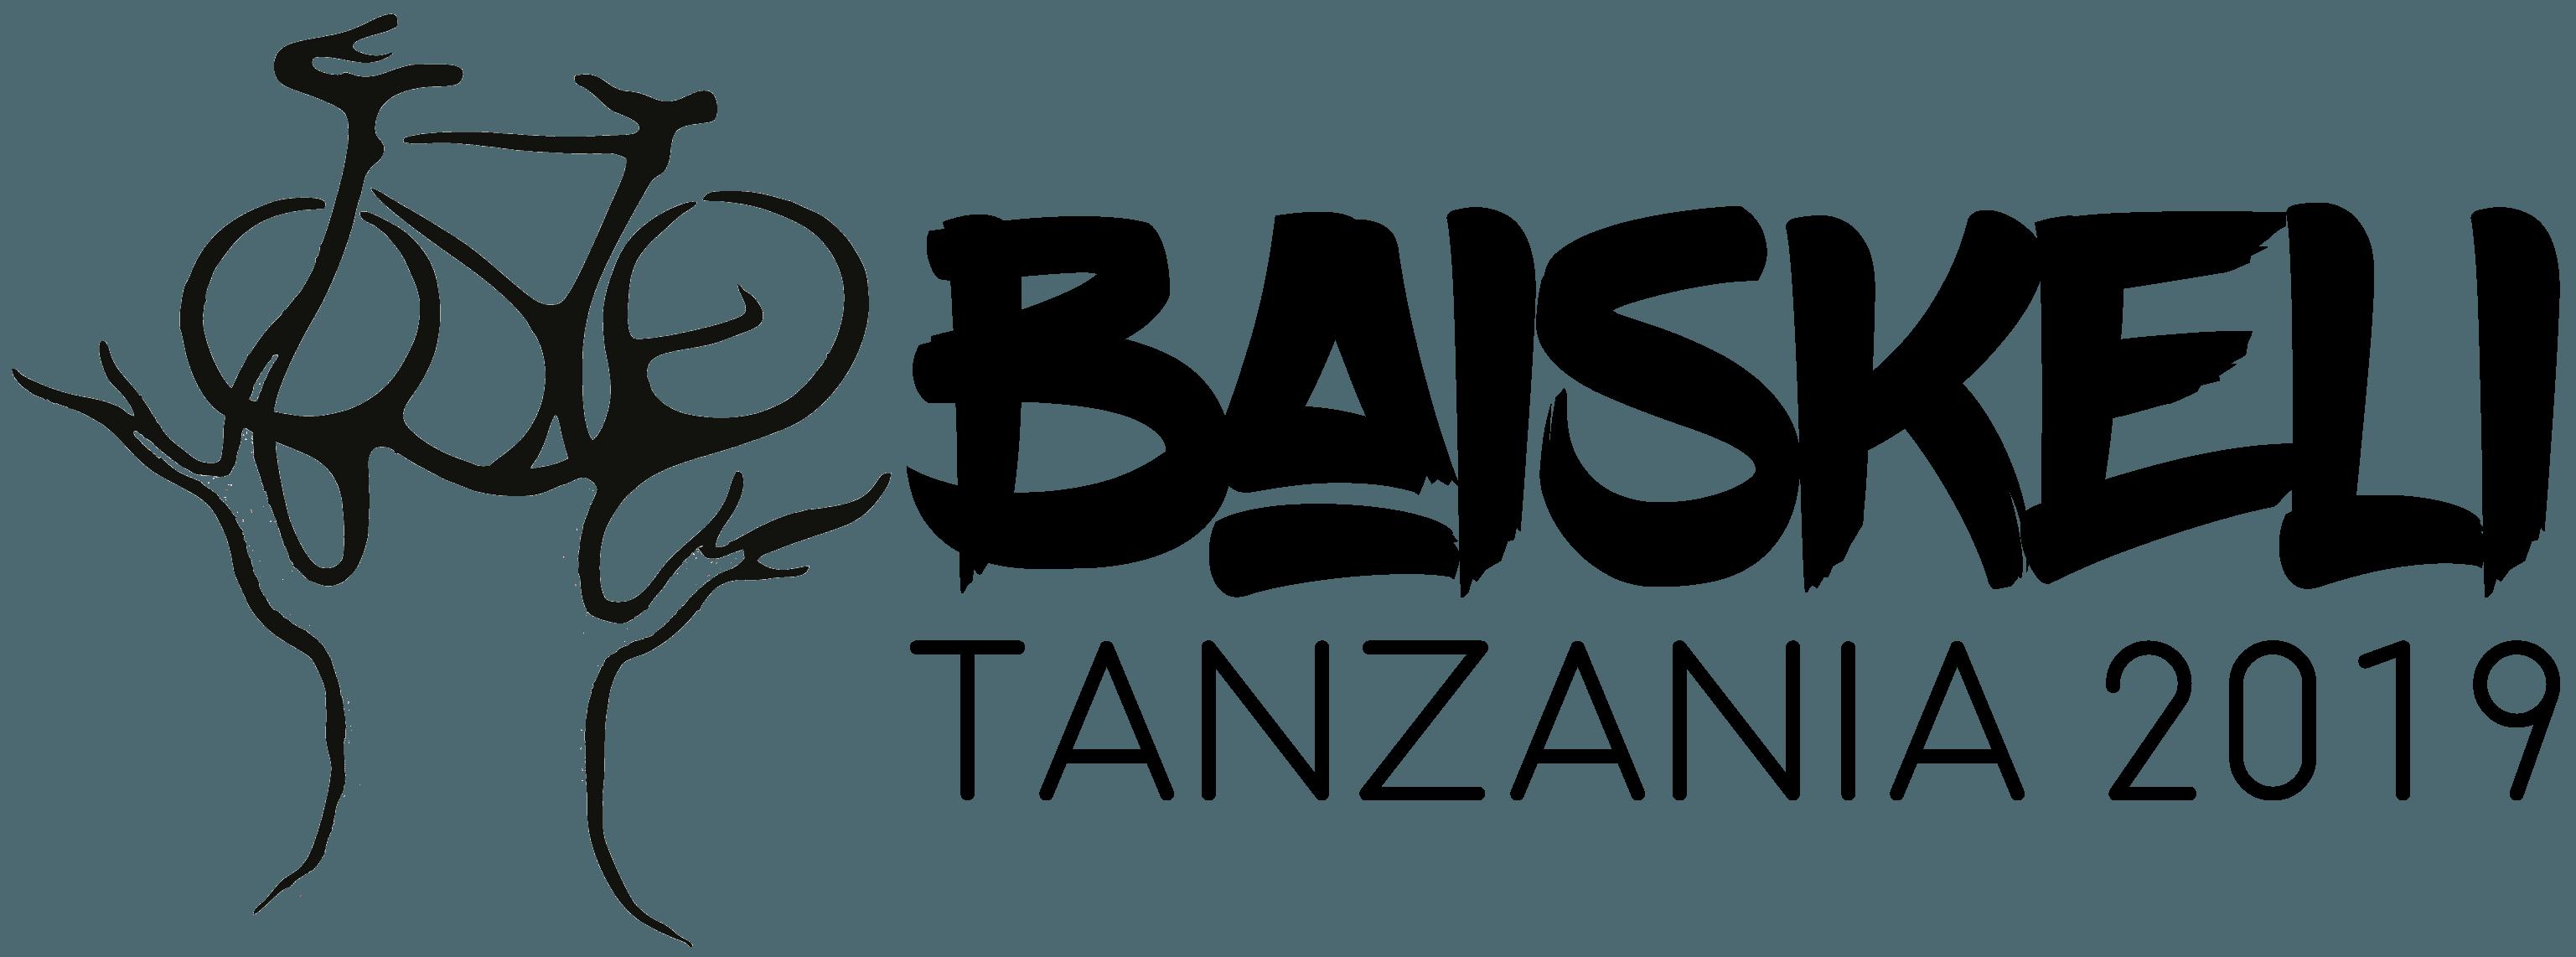 baiskeli2019_logo_light